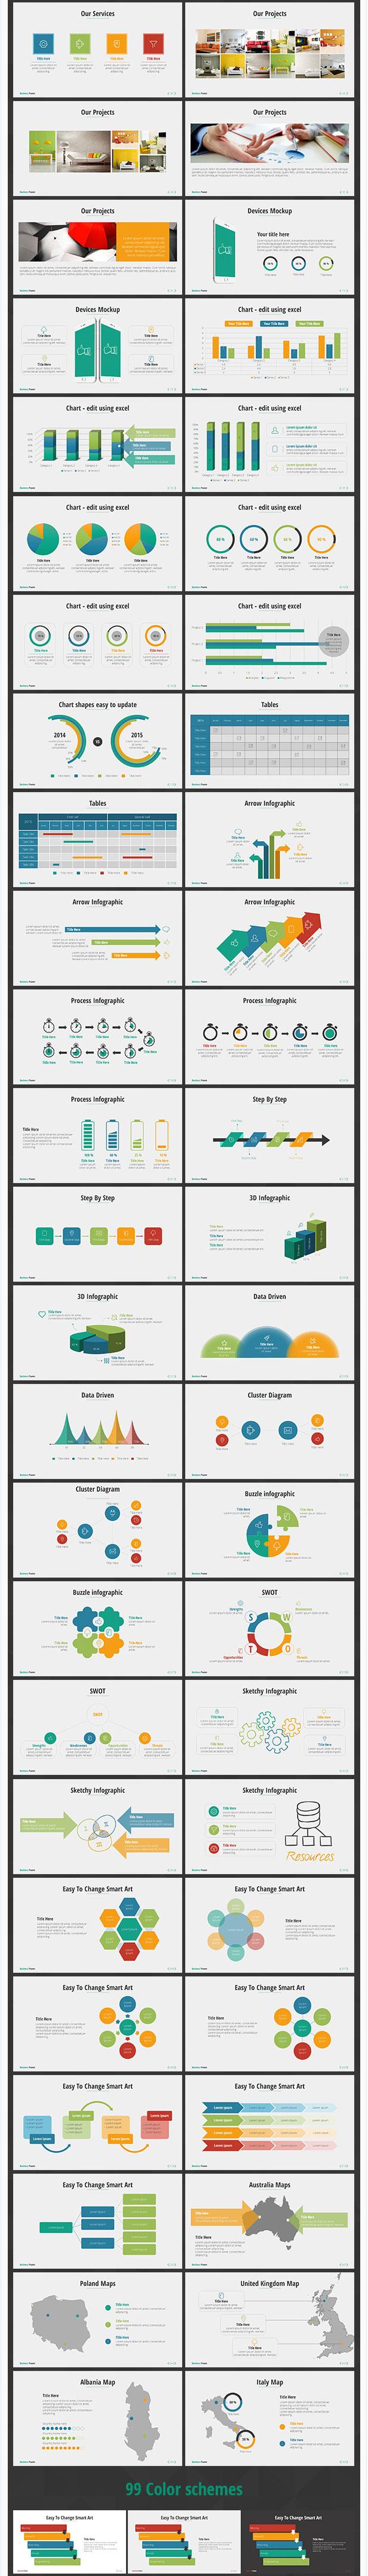 Best Business Power PowerPoint Presentation Template